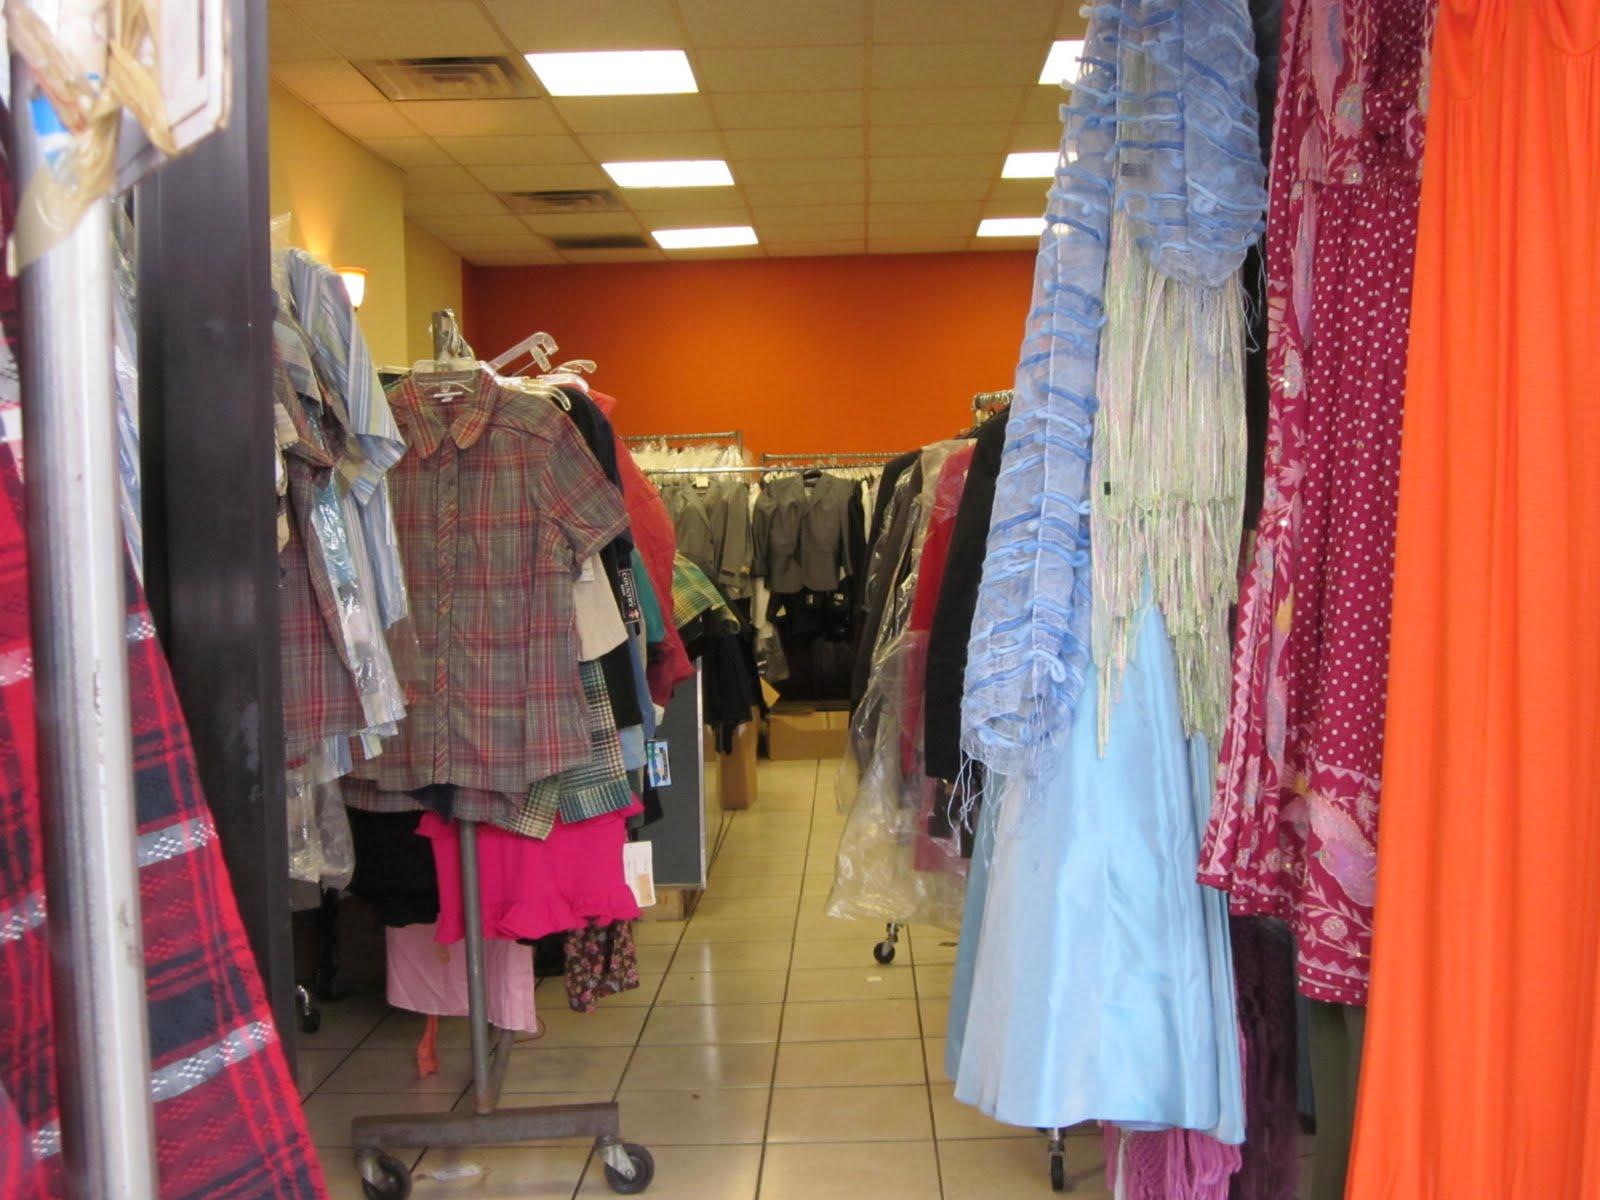 Church clothing store